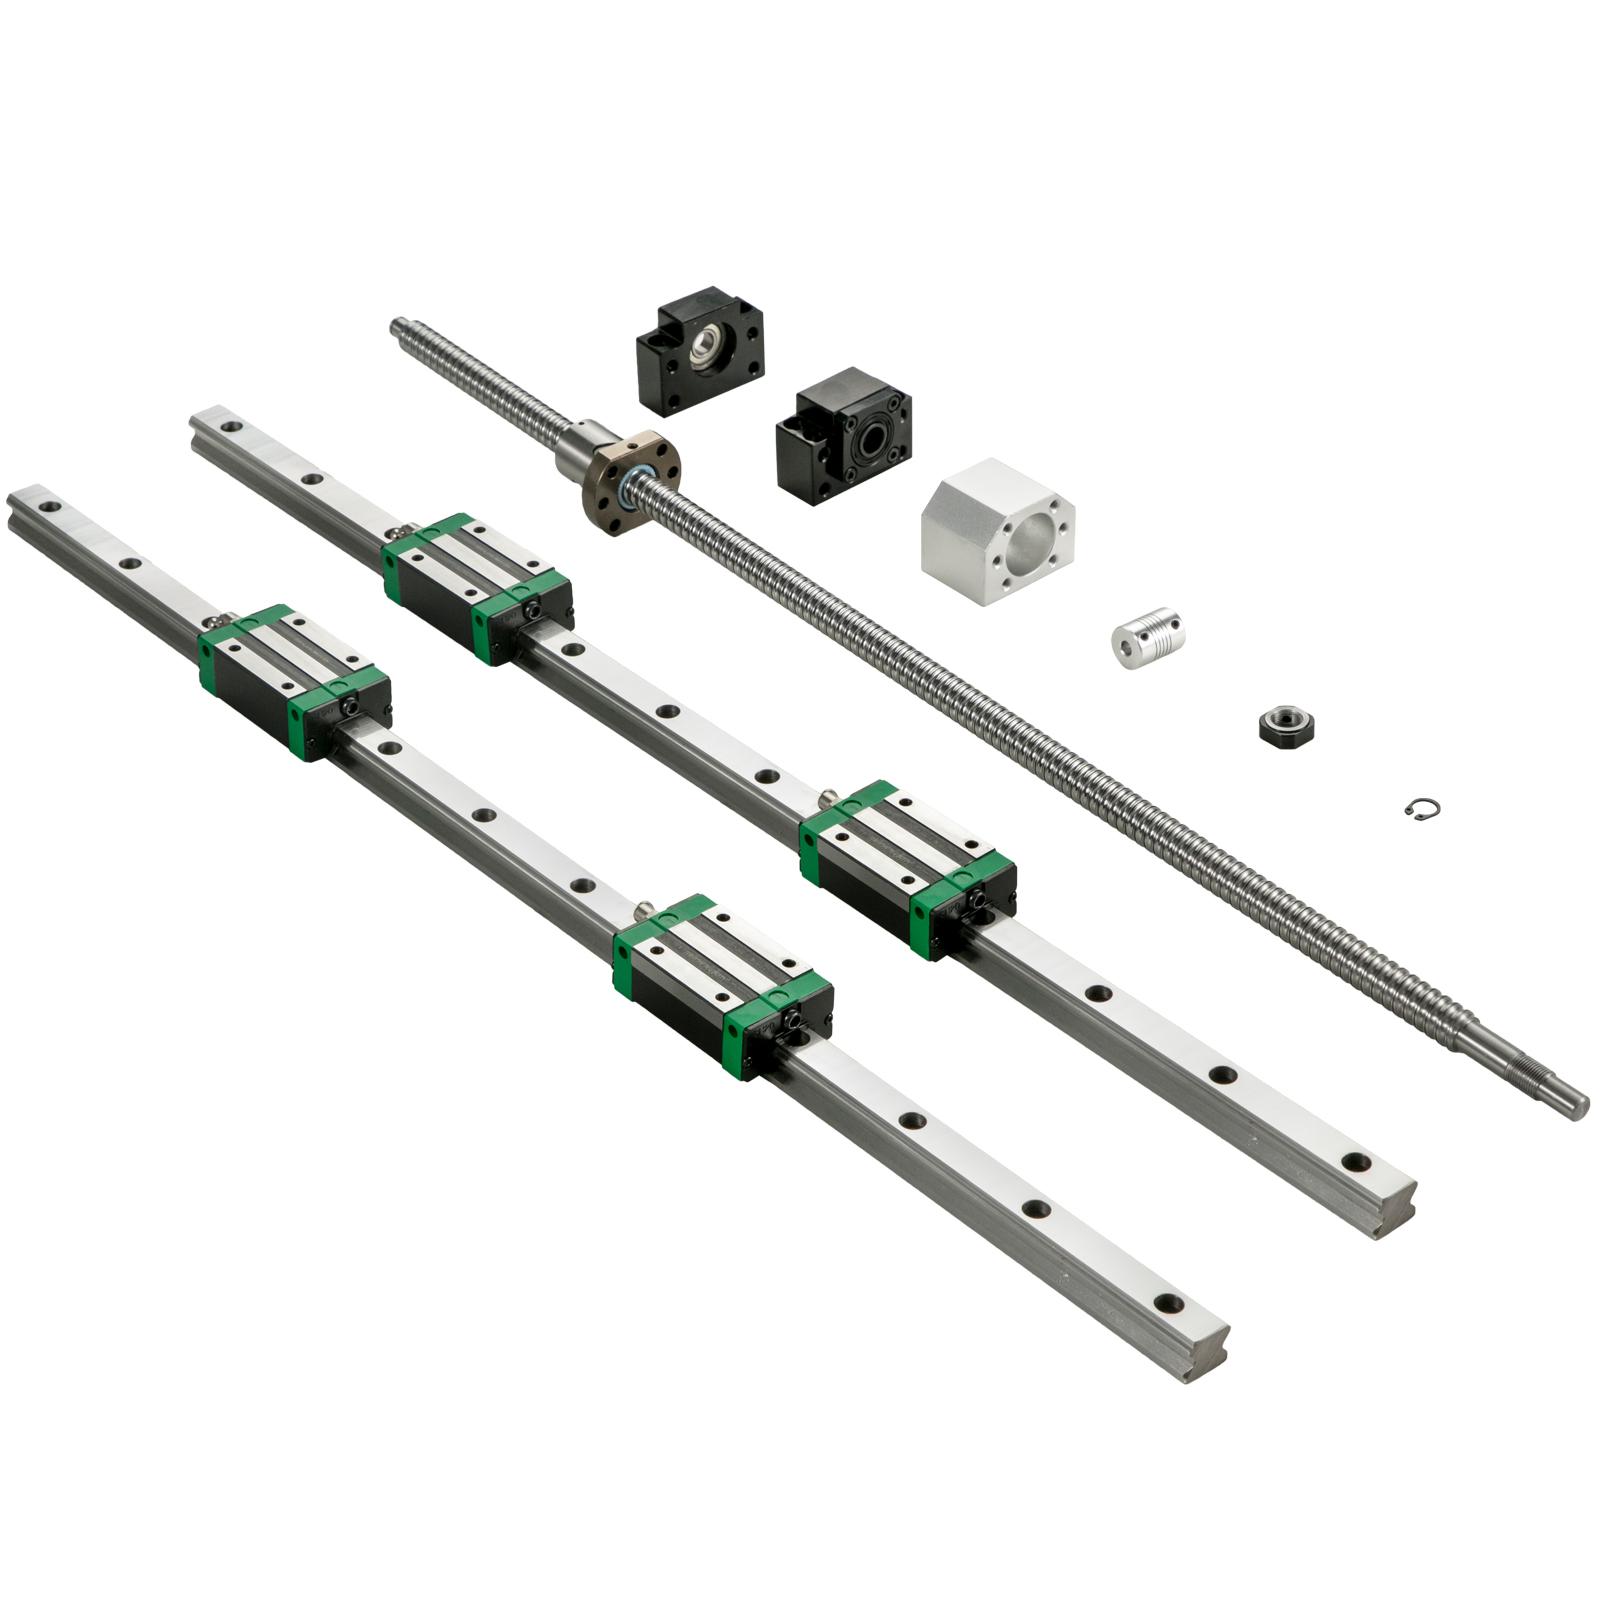 2X Linear Rail HGR20-200-2000mm 4X Blocks Ballscrew RM1605 BF12//BK12 CNC Set